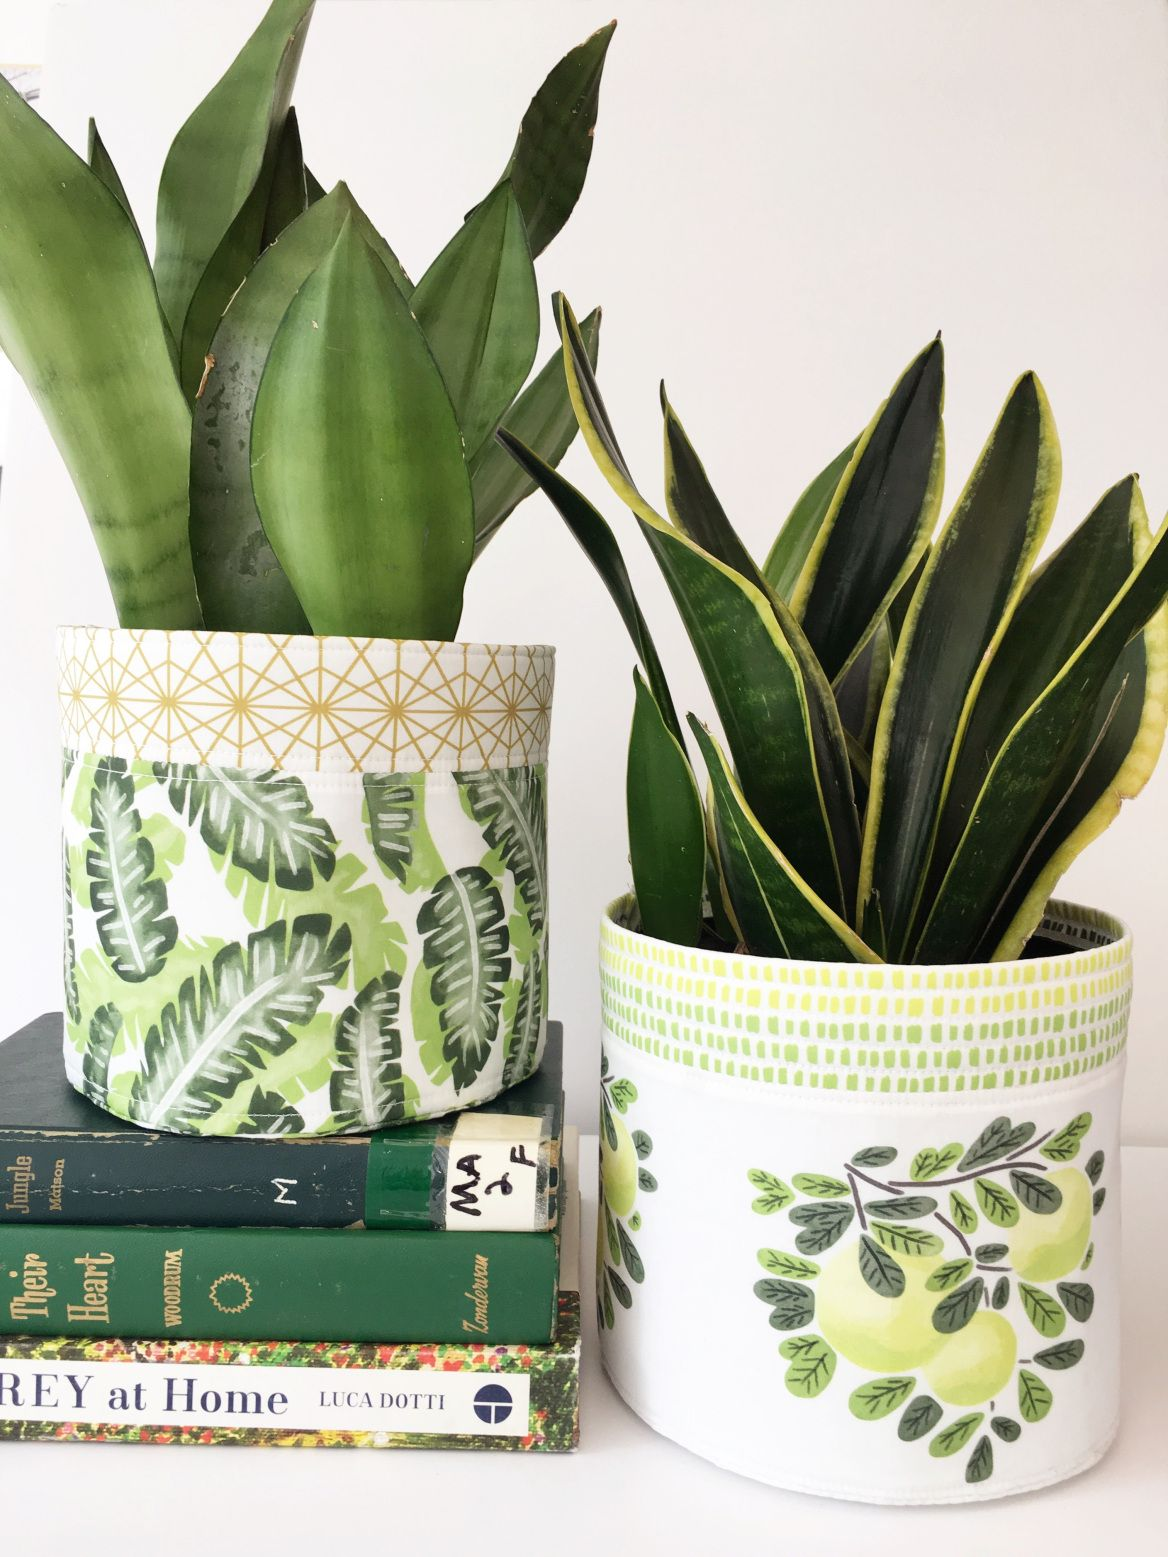 DIY Fabric Planter Diy sewing projects, Diy grow bags